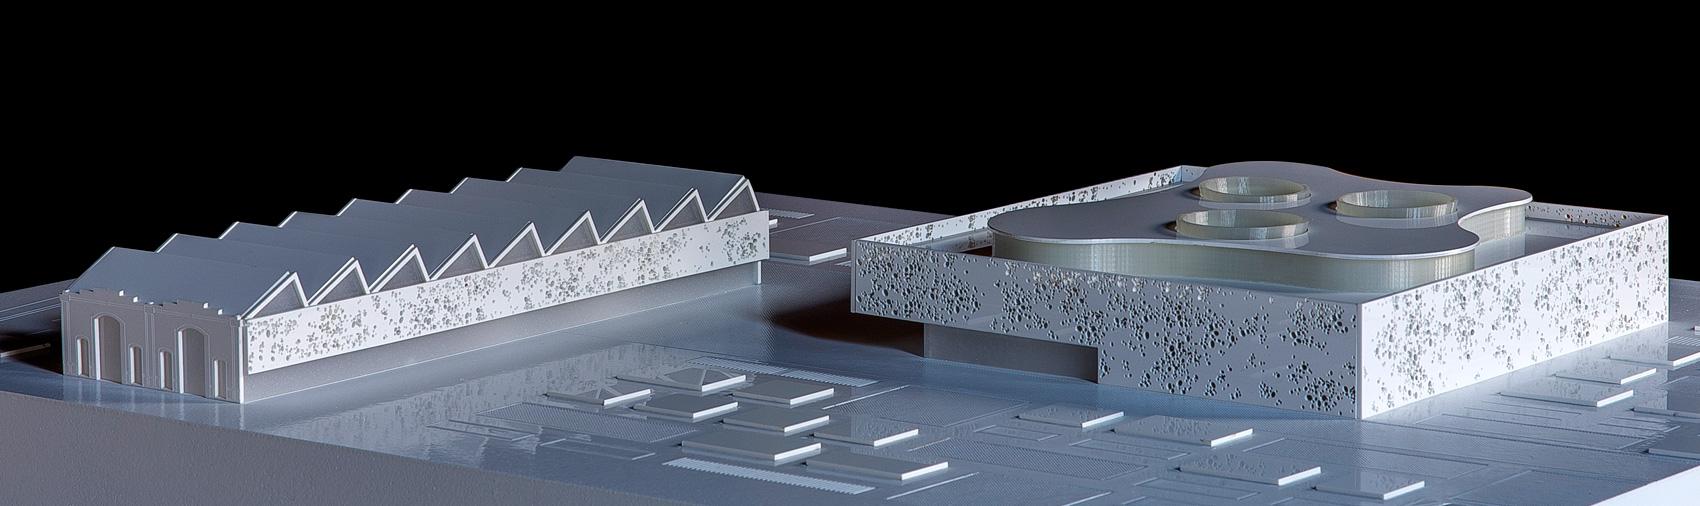 maqueta-arquitectura-concurso-valencia-iluminada-pfc-centro-musical-5